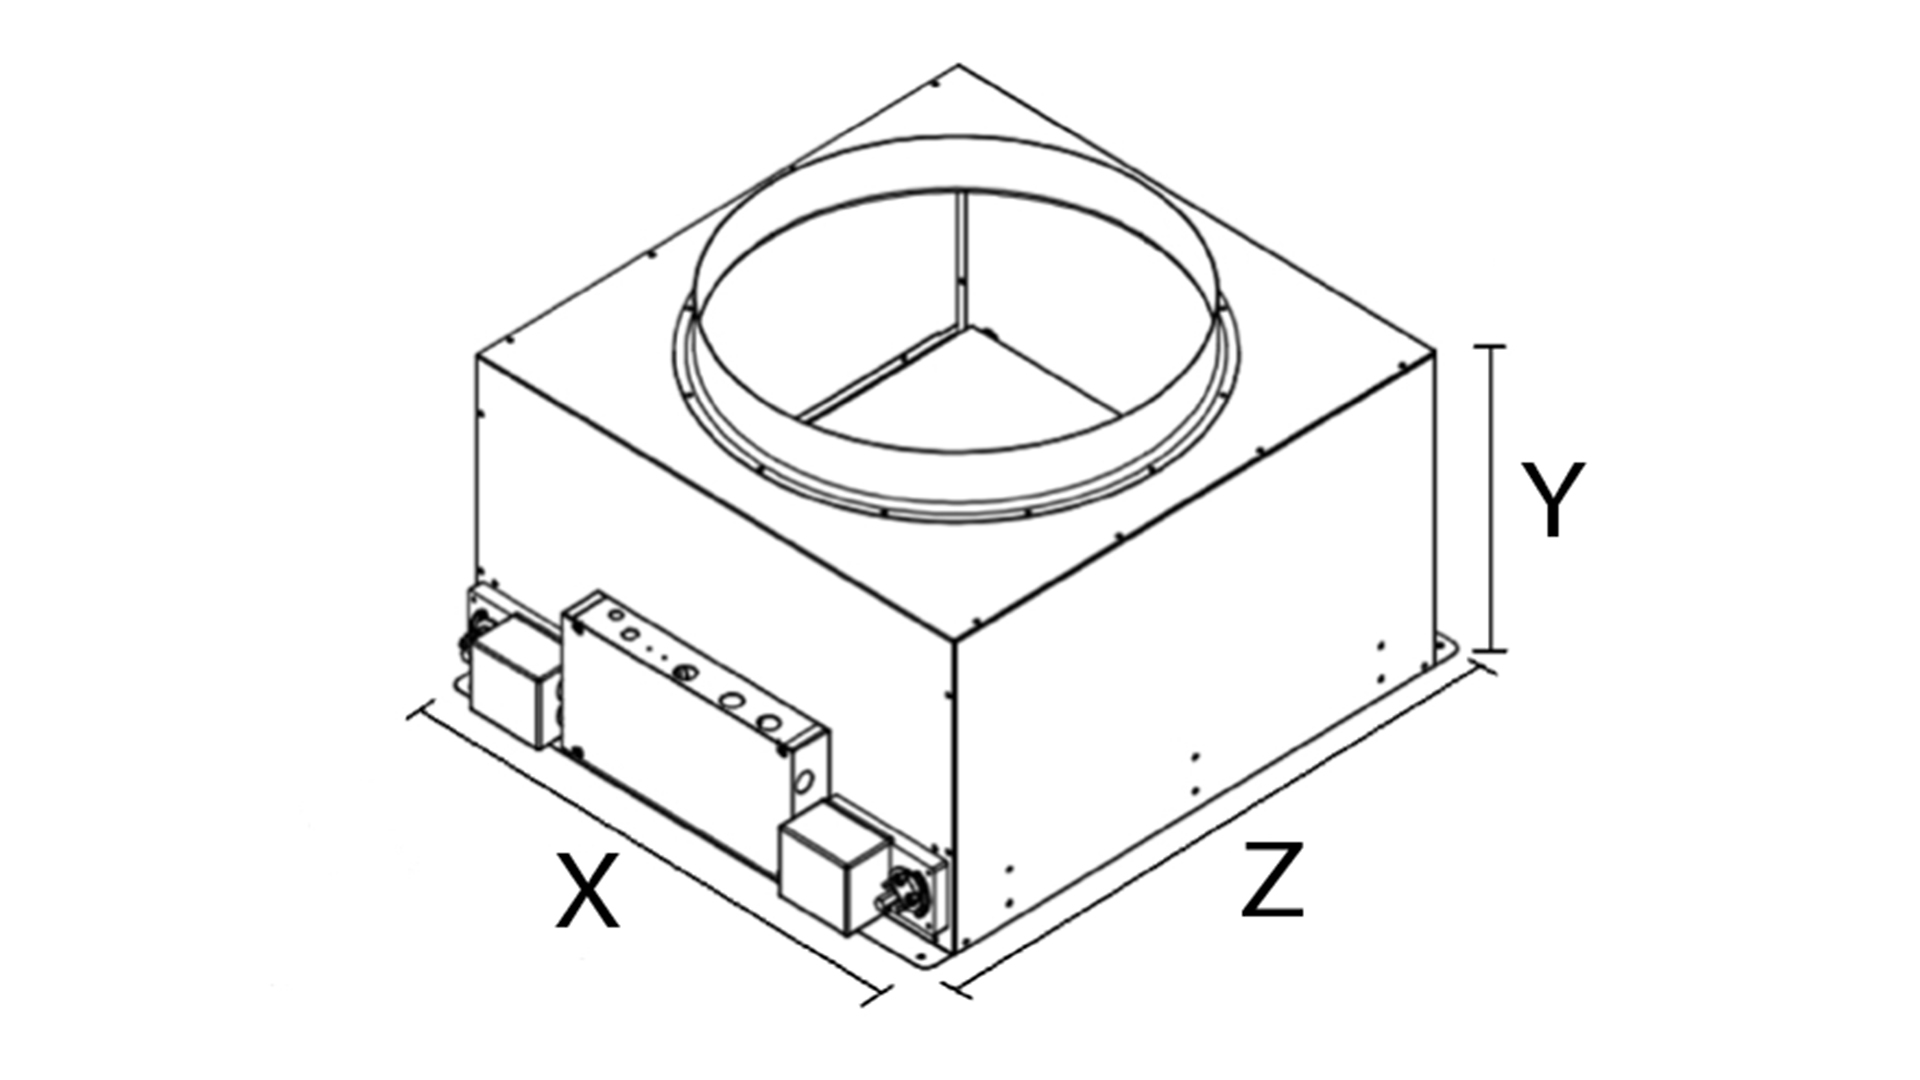 Vertical Damper Installation Part 1 Airscape Models